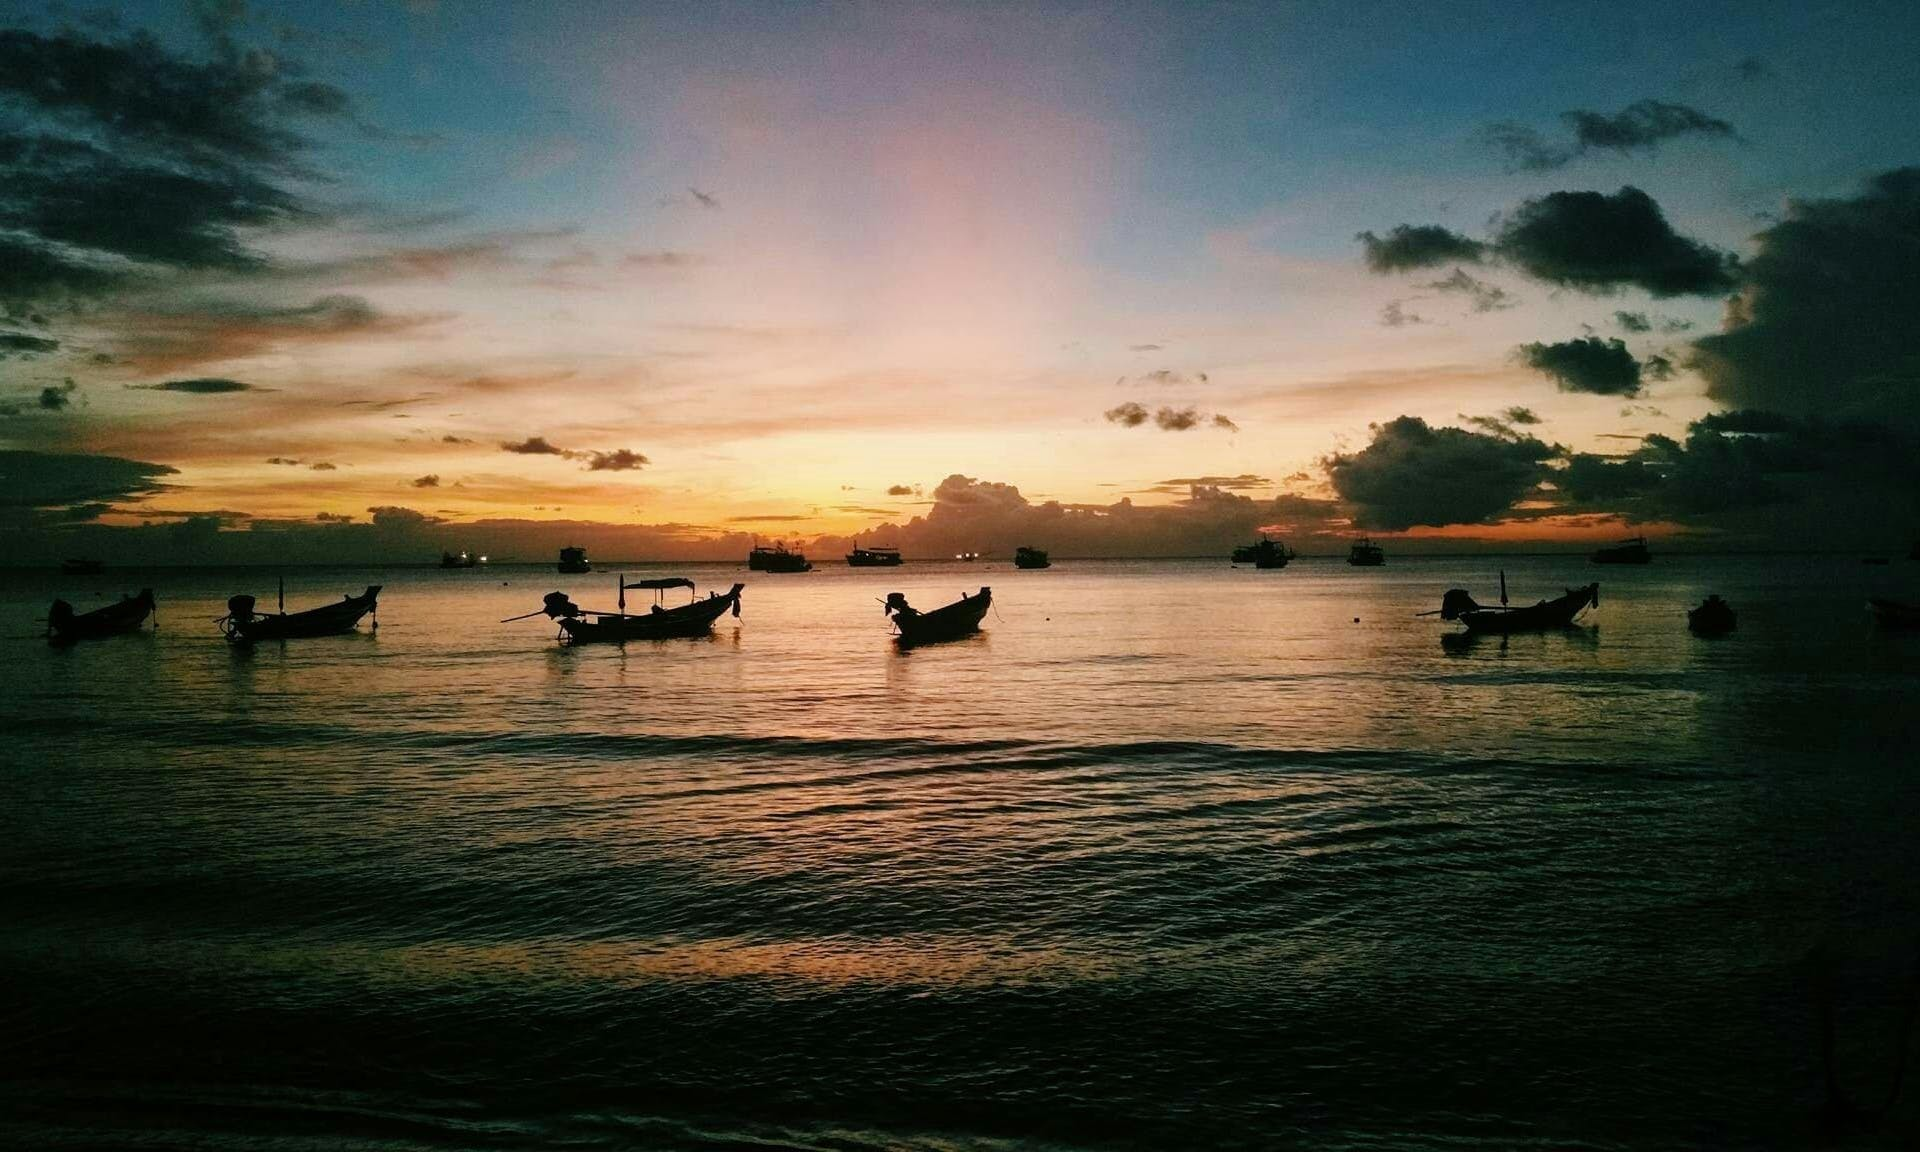 Fast Boat Tour in Tambon Ko Tao